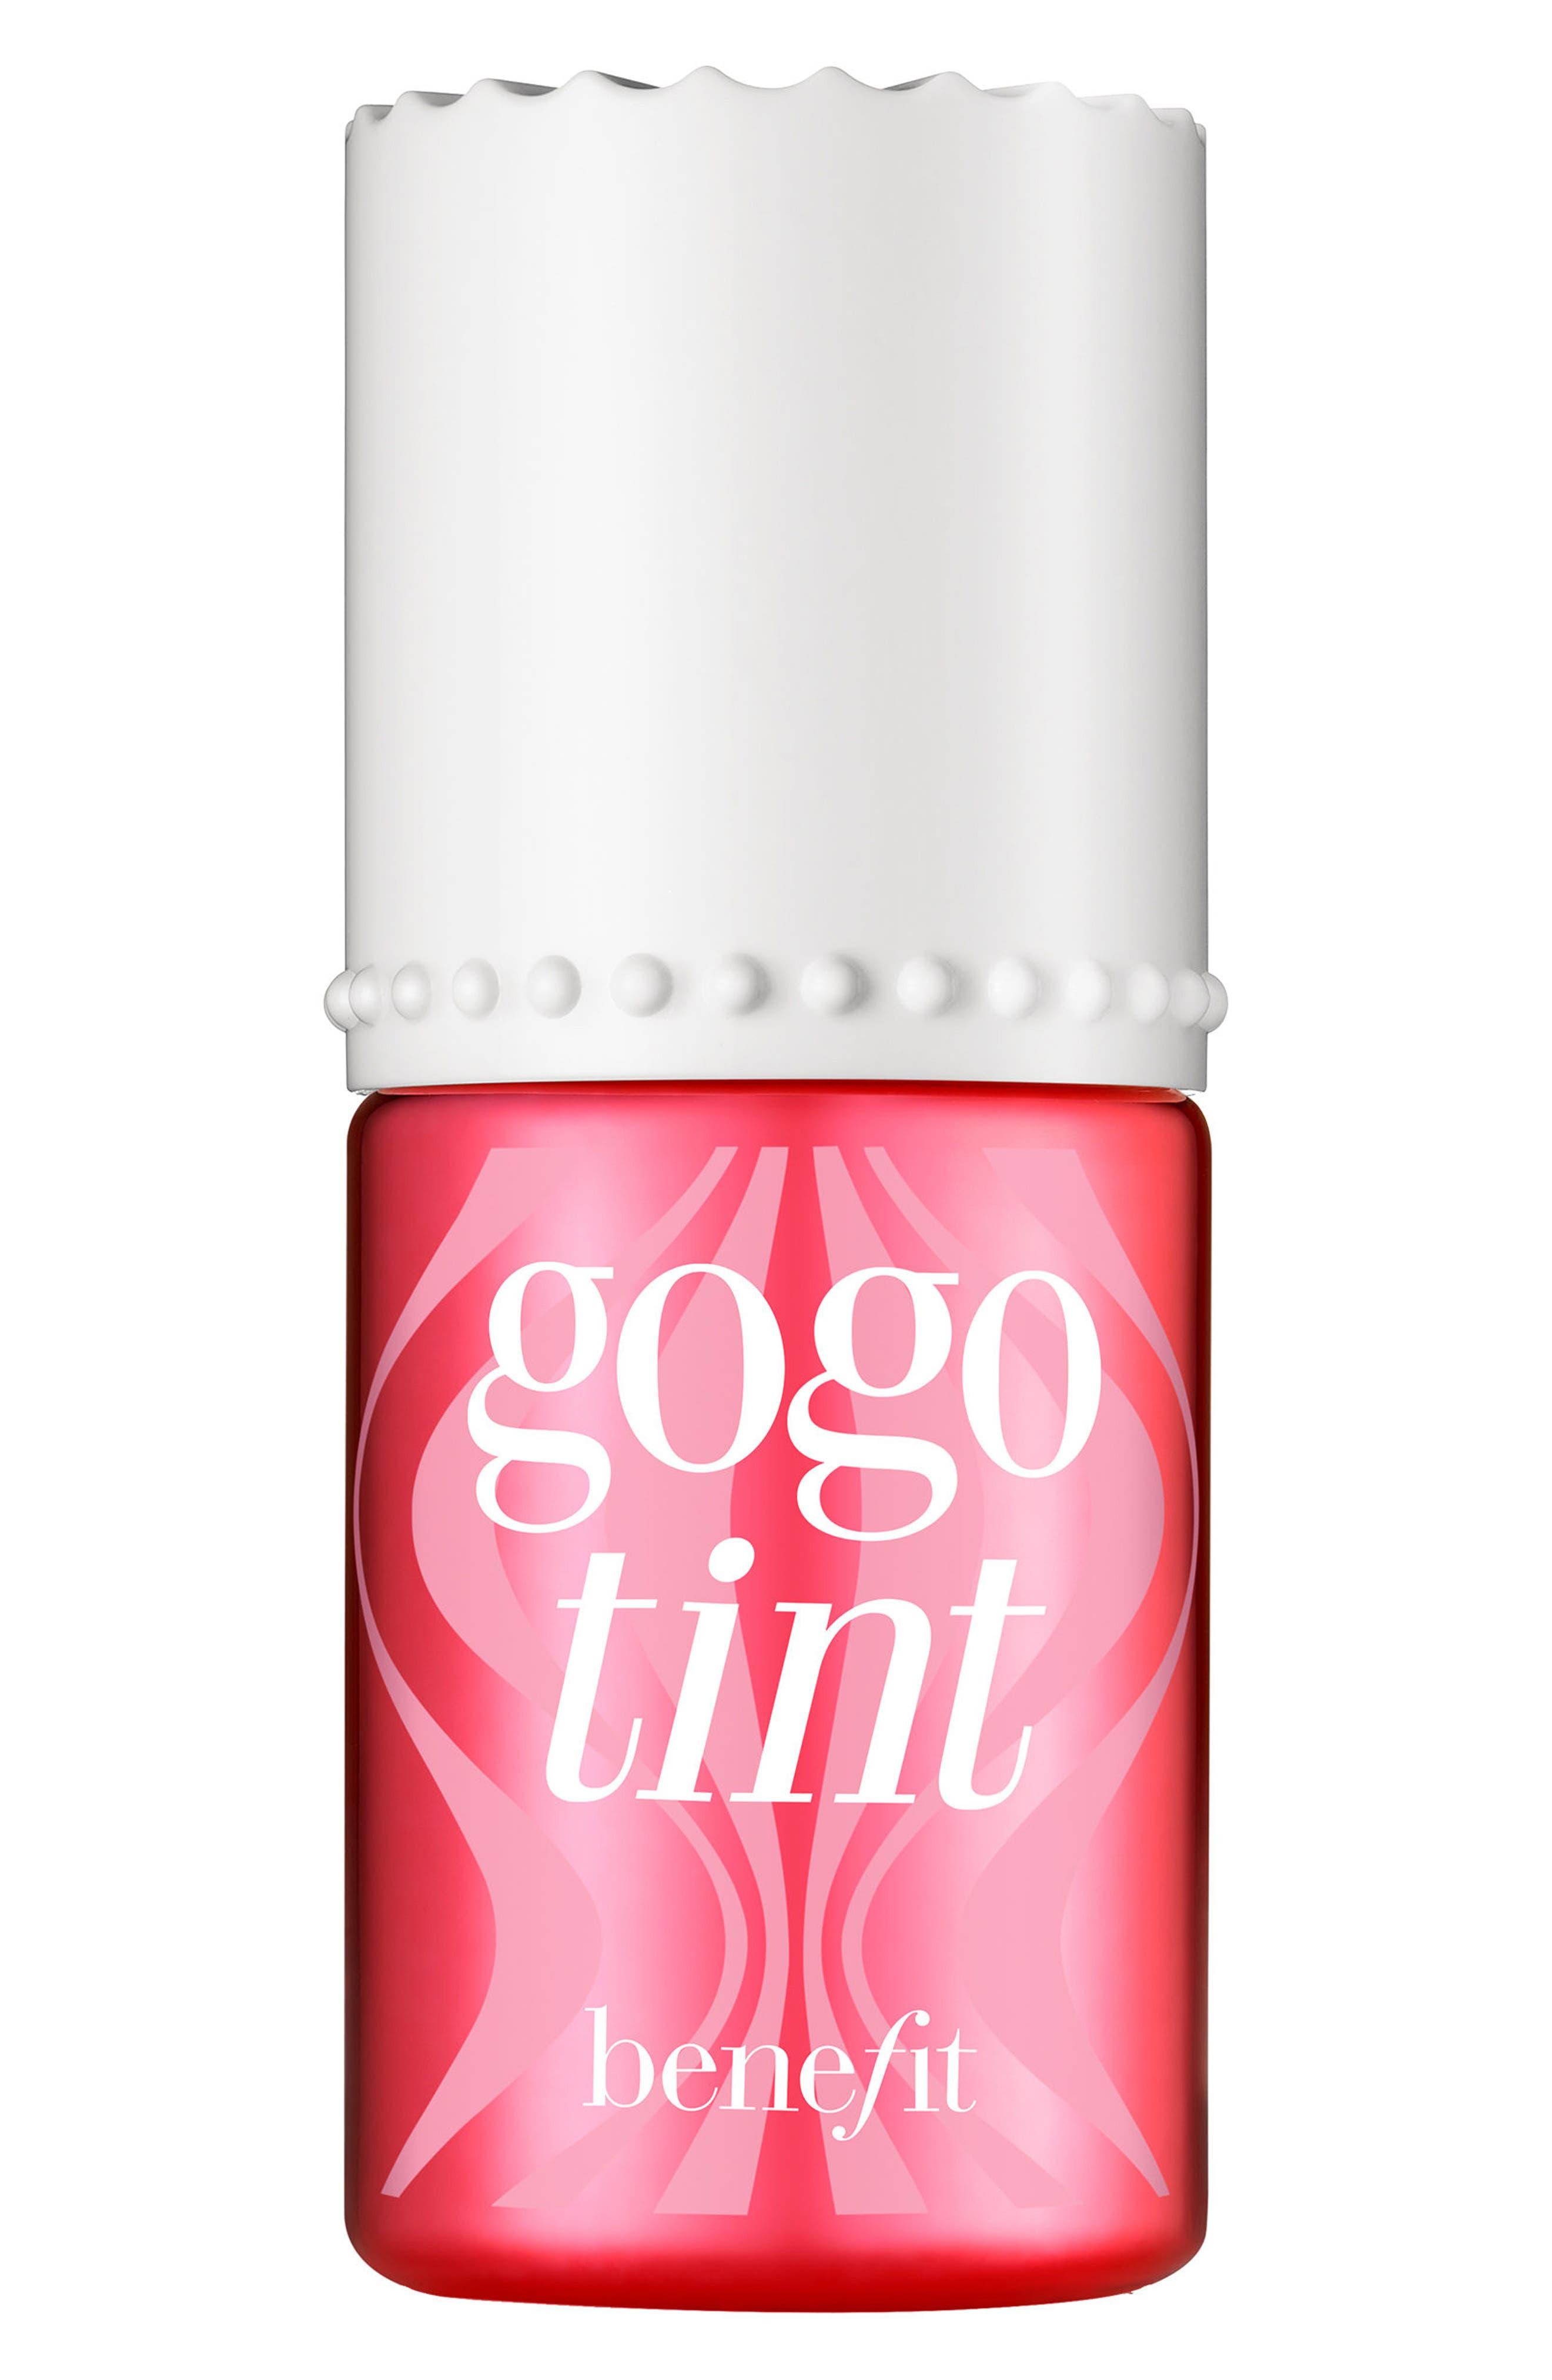 Benefit Cheek & Lip Stain,                             Alternate thumbnail 2, color,                             Gogotint/ Cherry Red